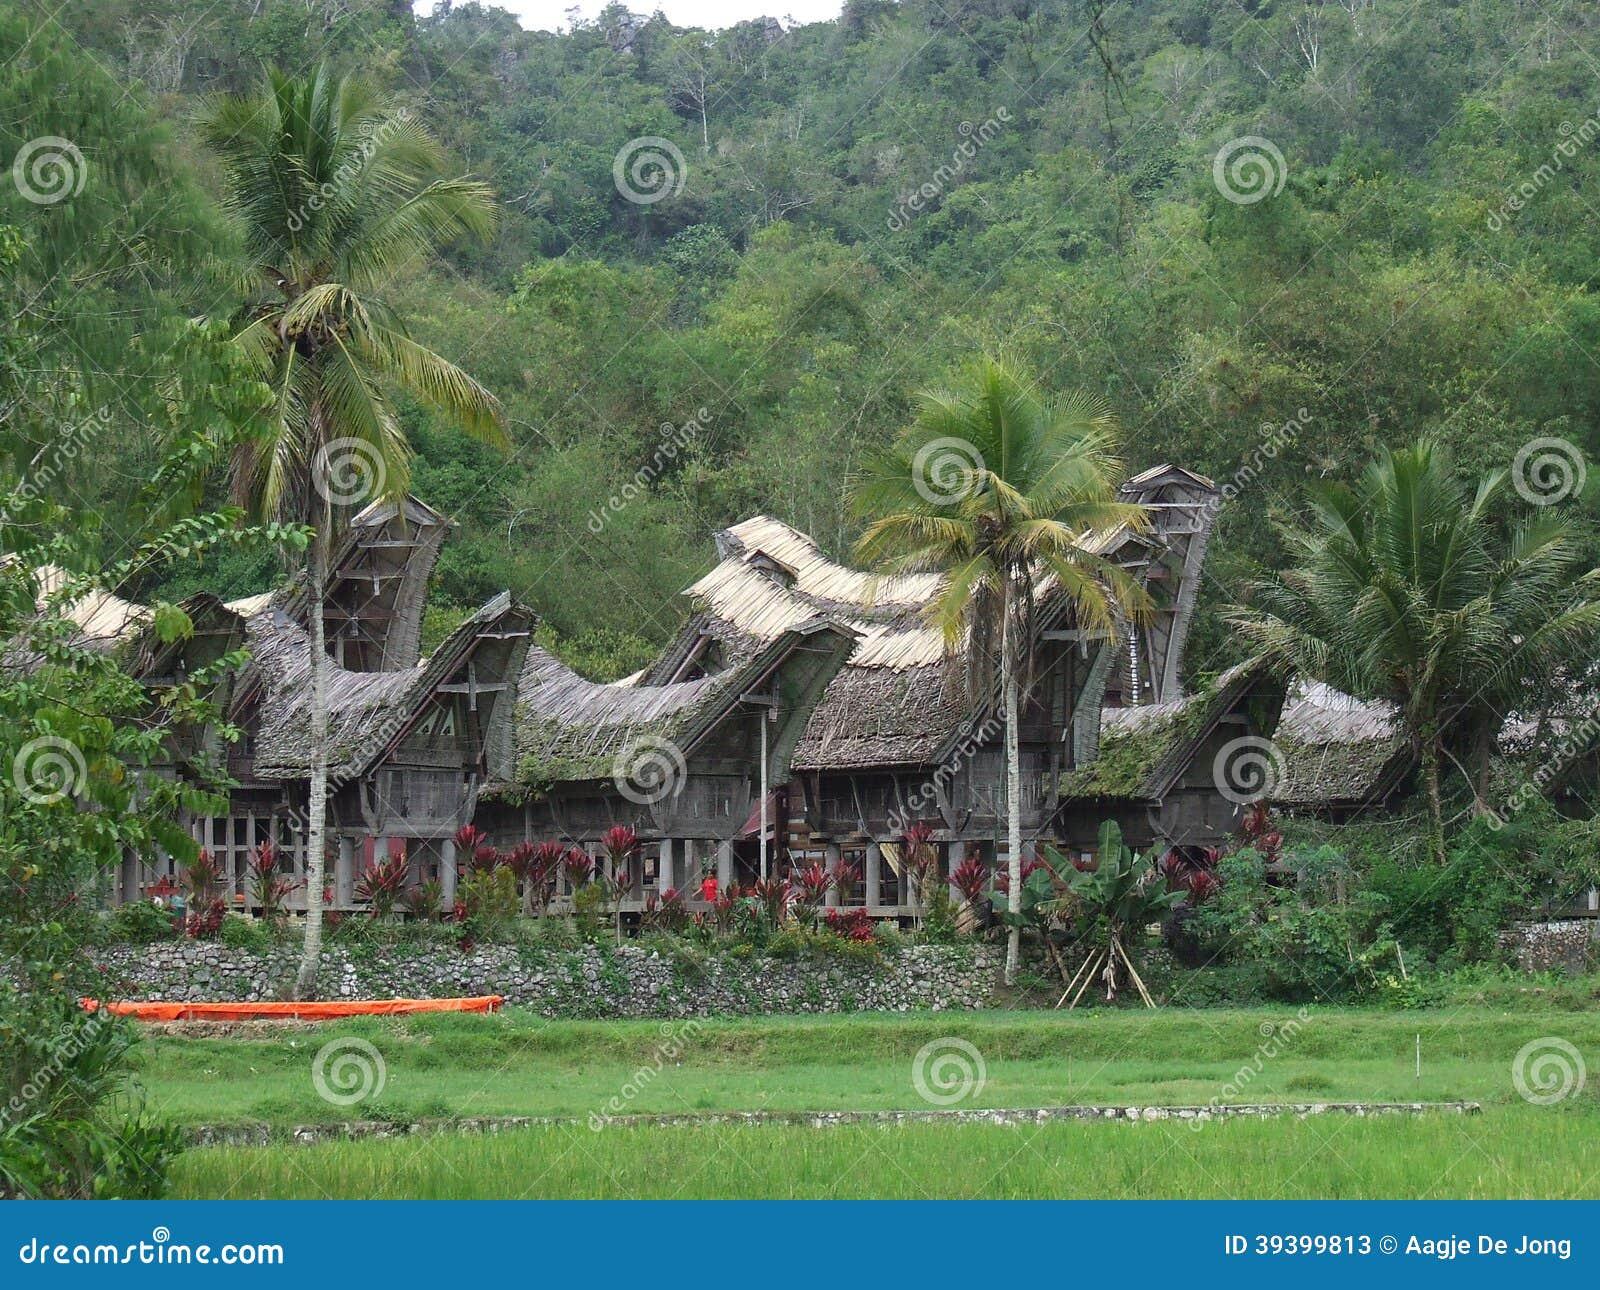 Ke te Kesu village Tana Toraja in Sulawesi